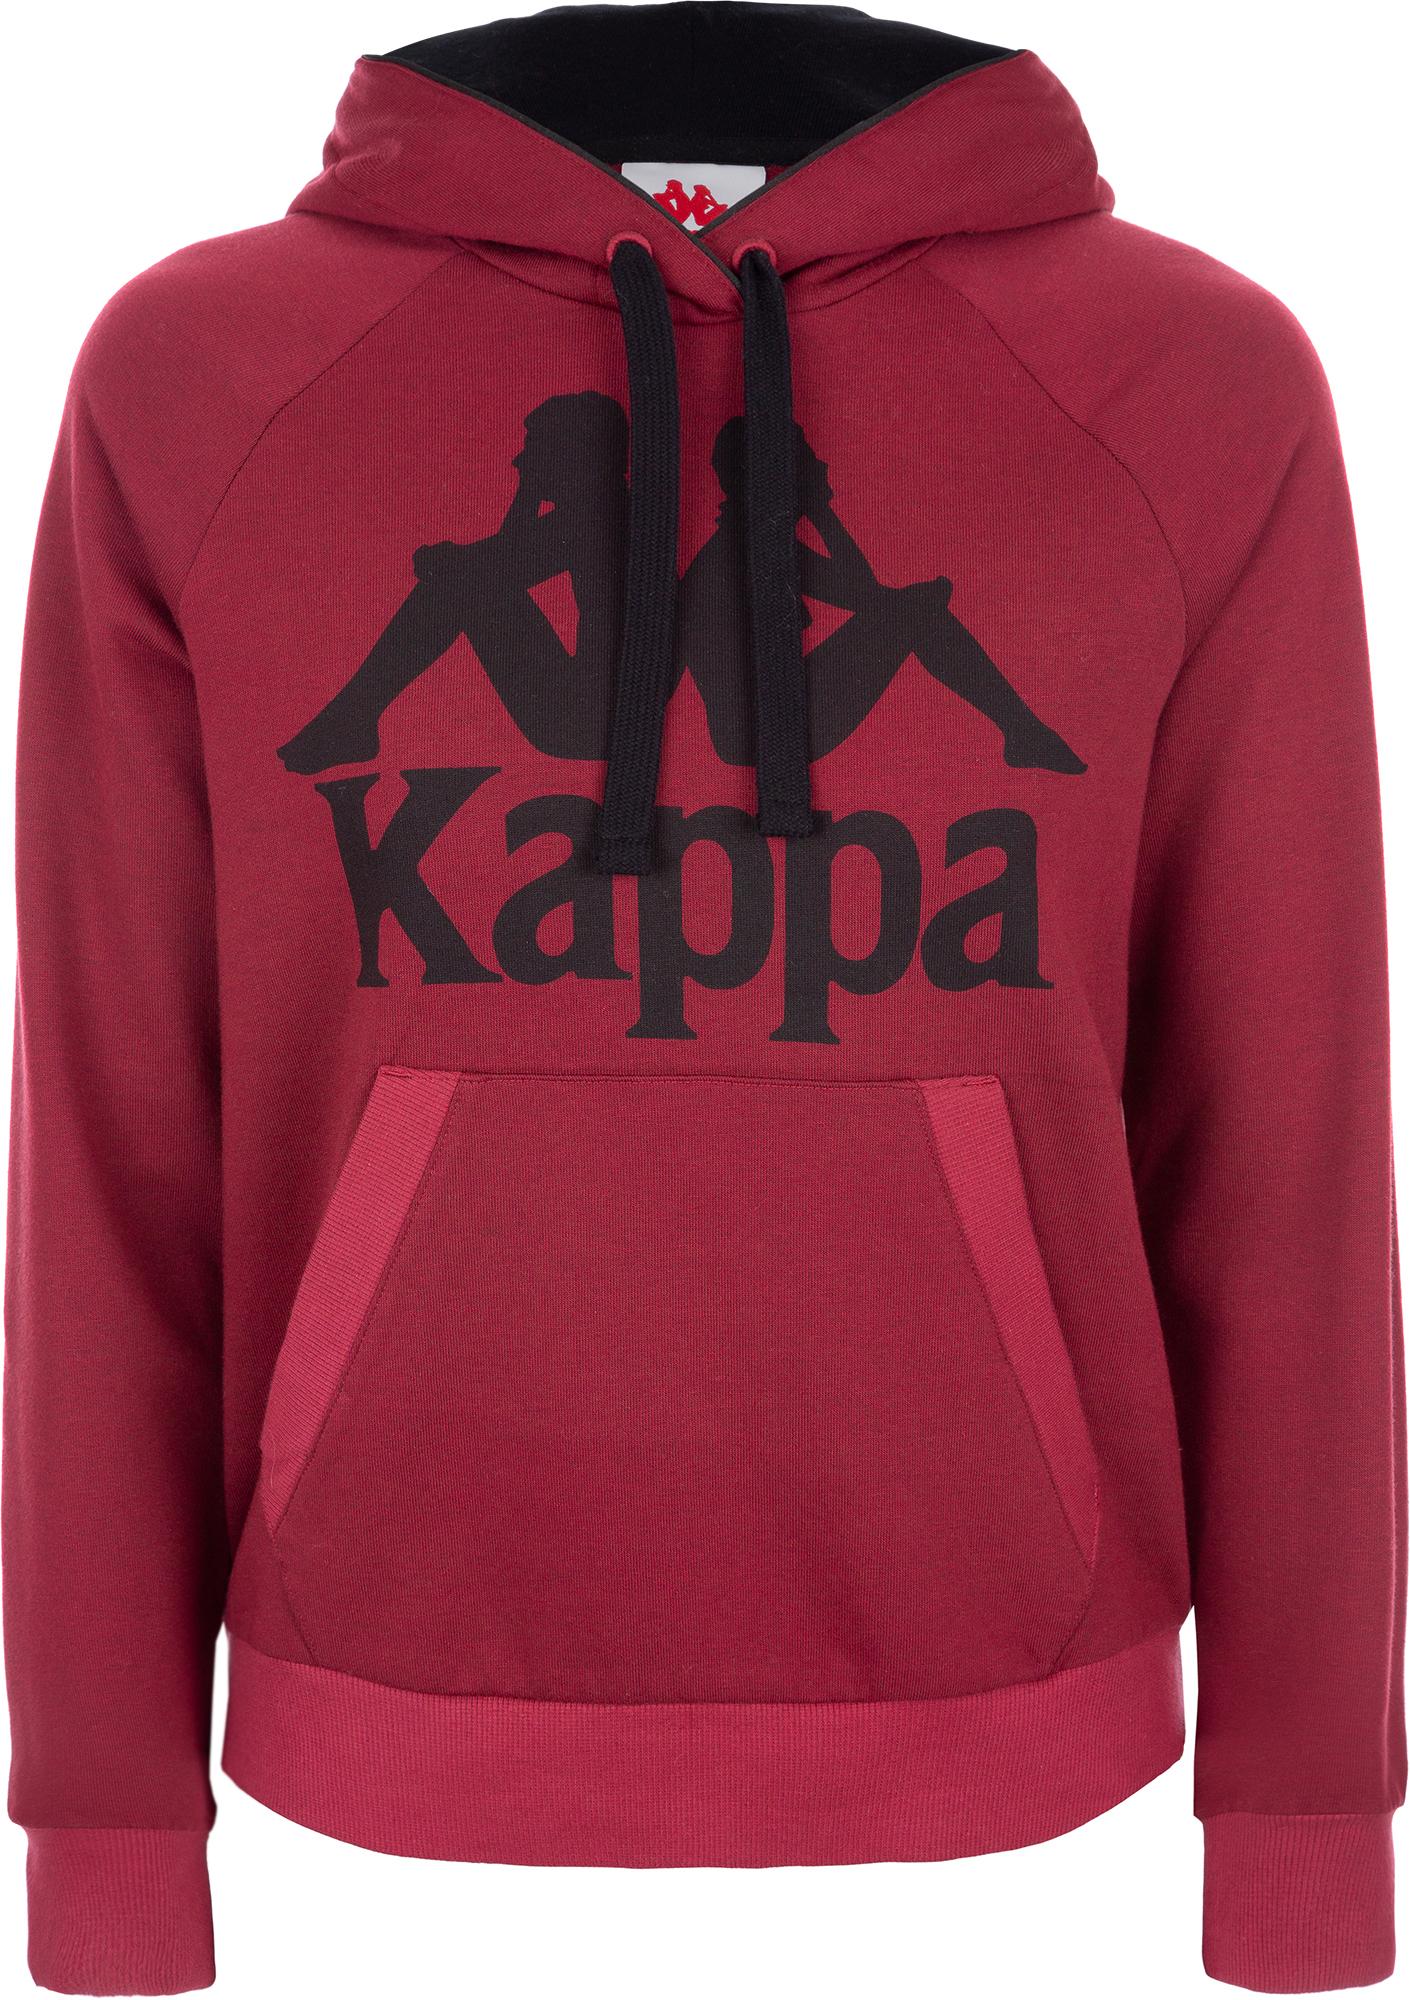 Kappa Худи женская Kappa, размер 50 цена